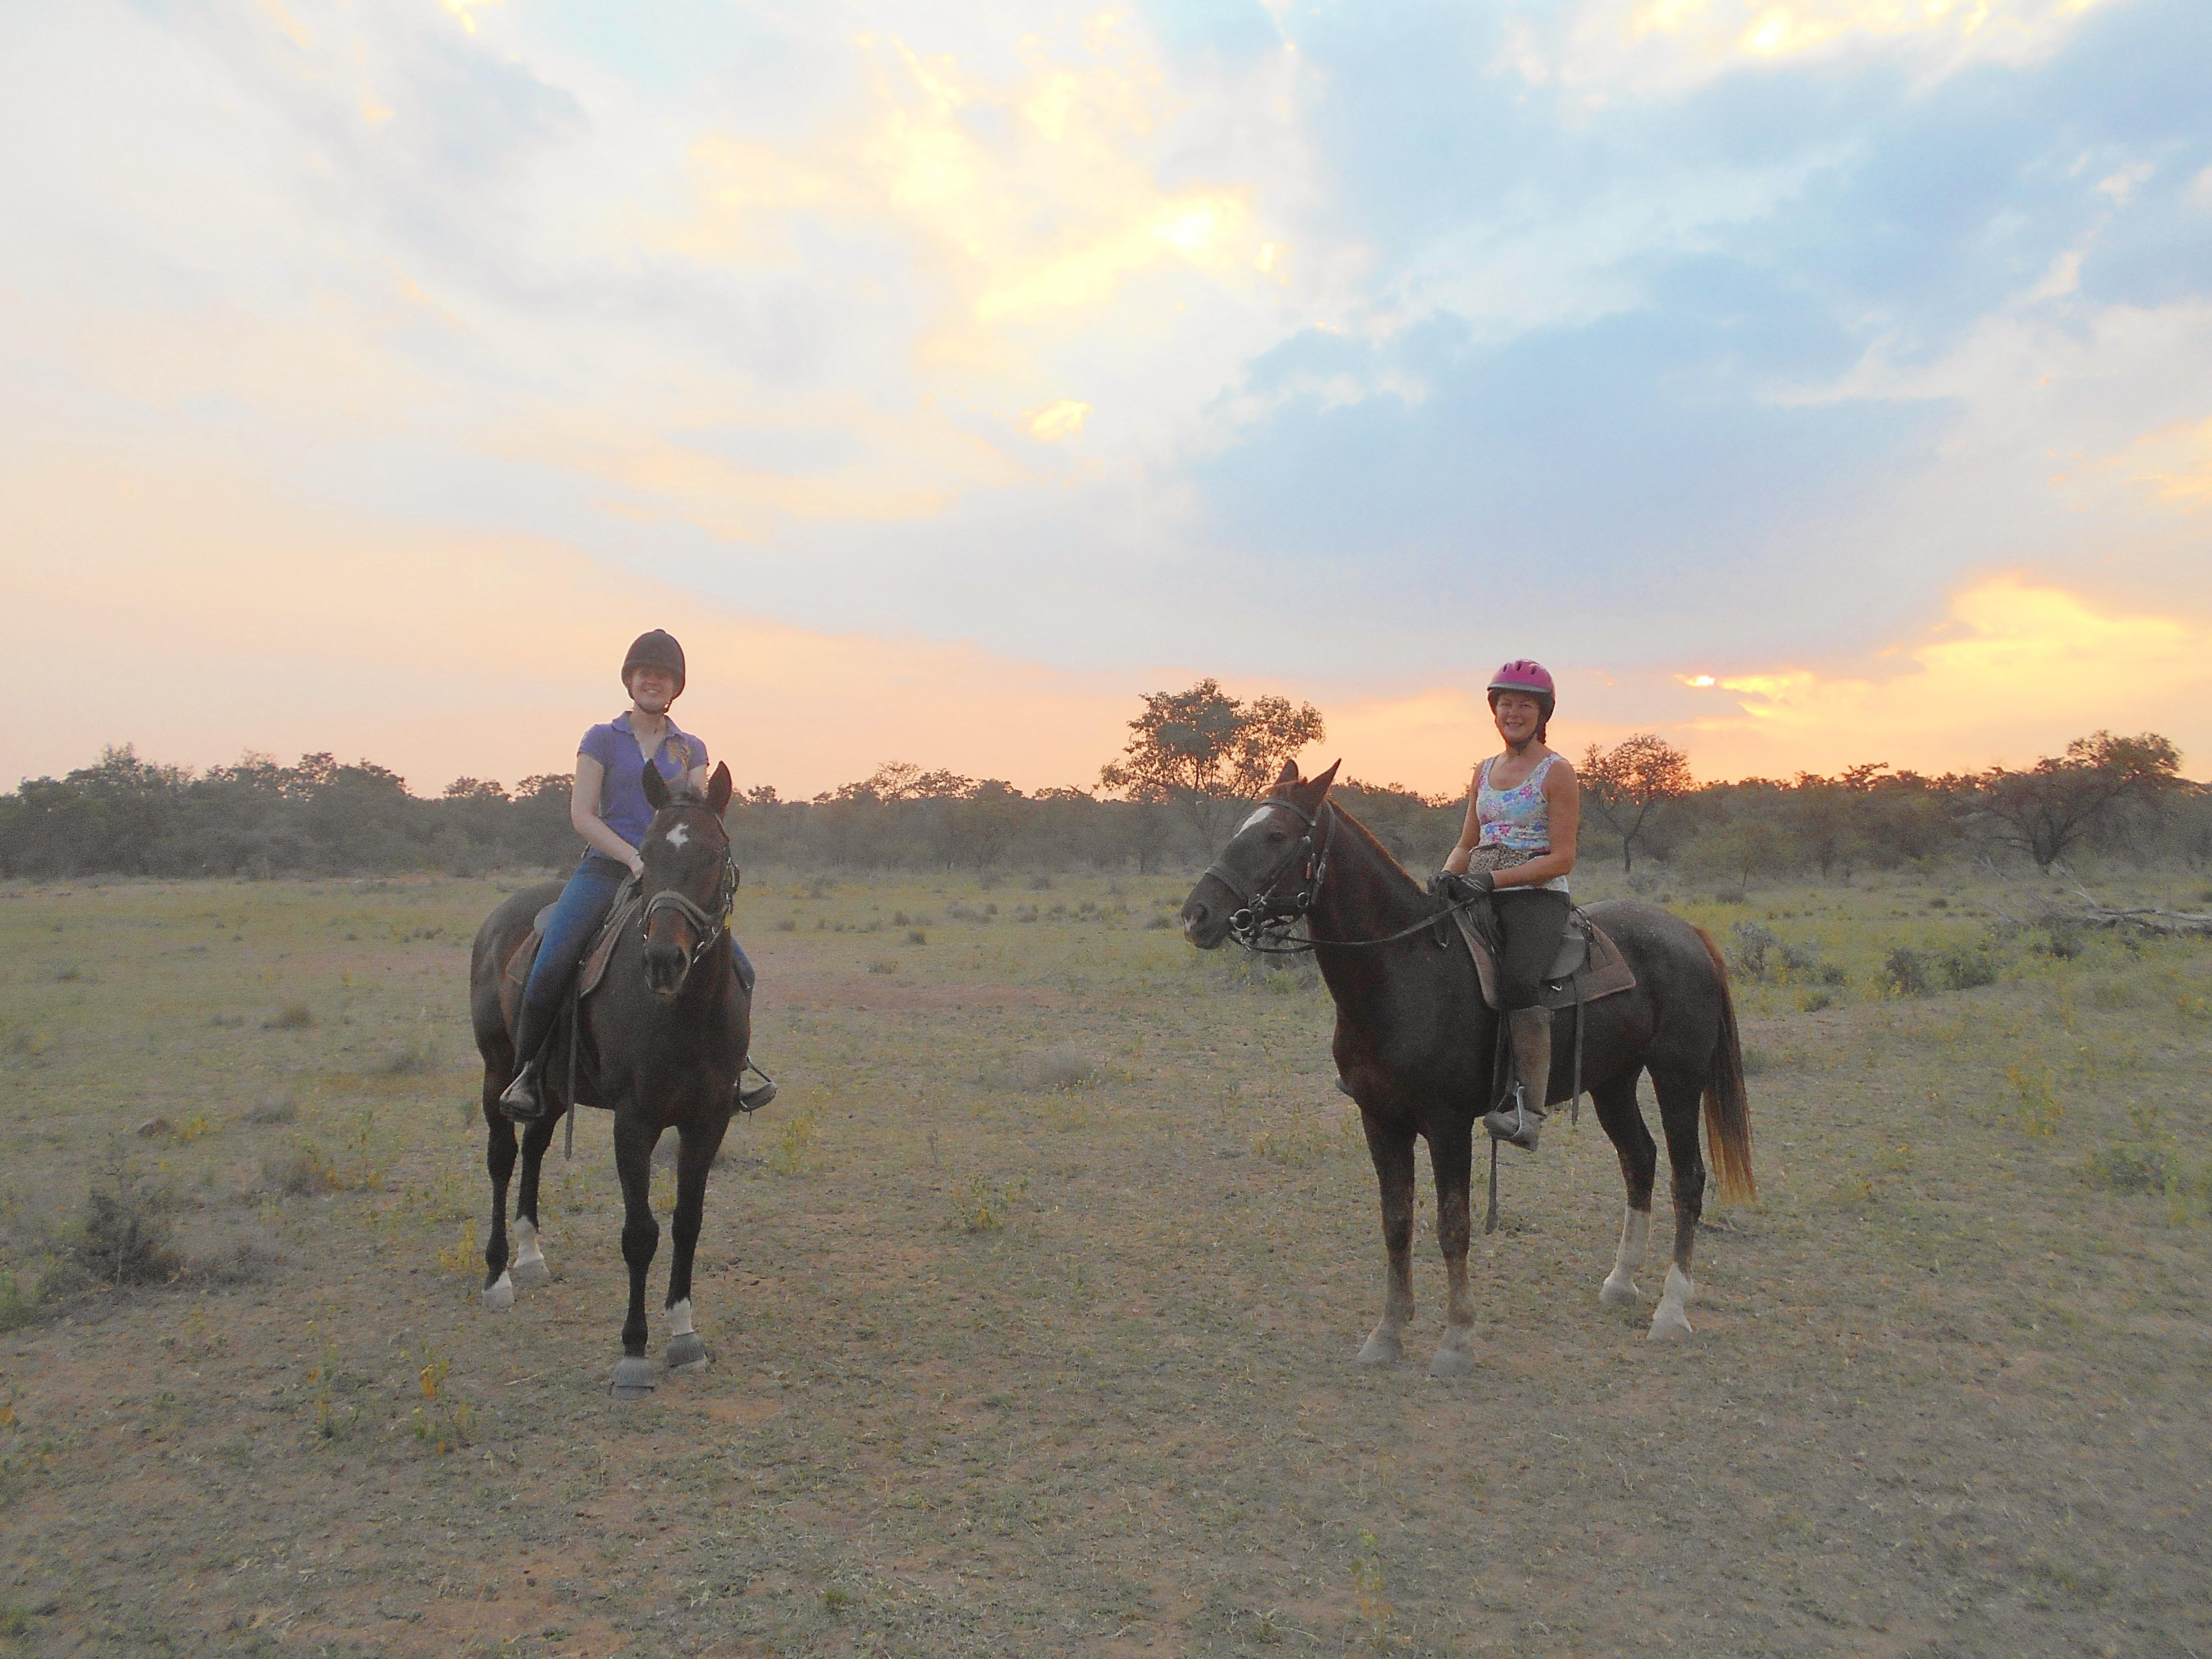 On horseback as the sun begins to dip towards the horizon